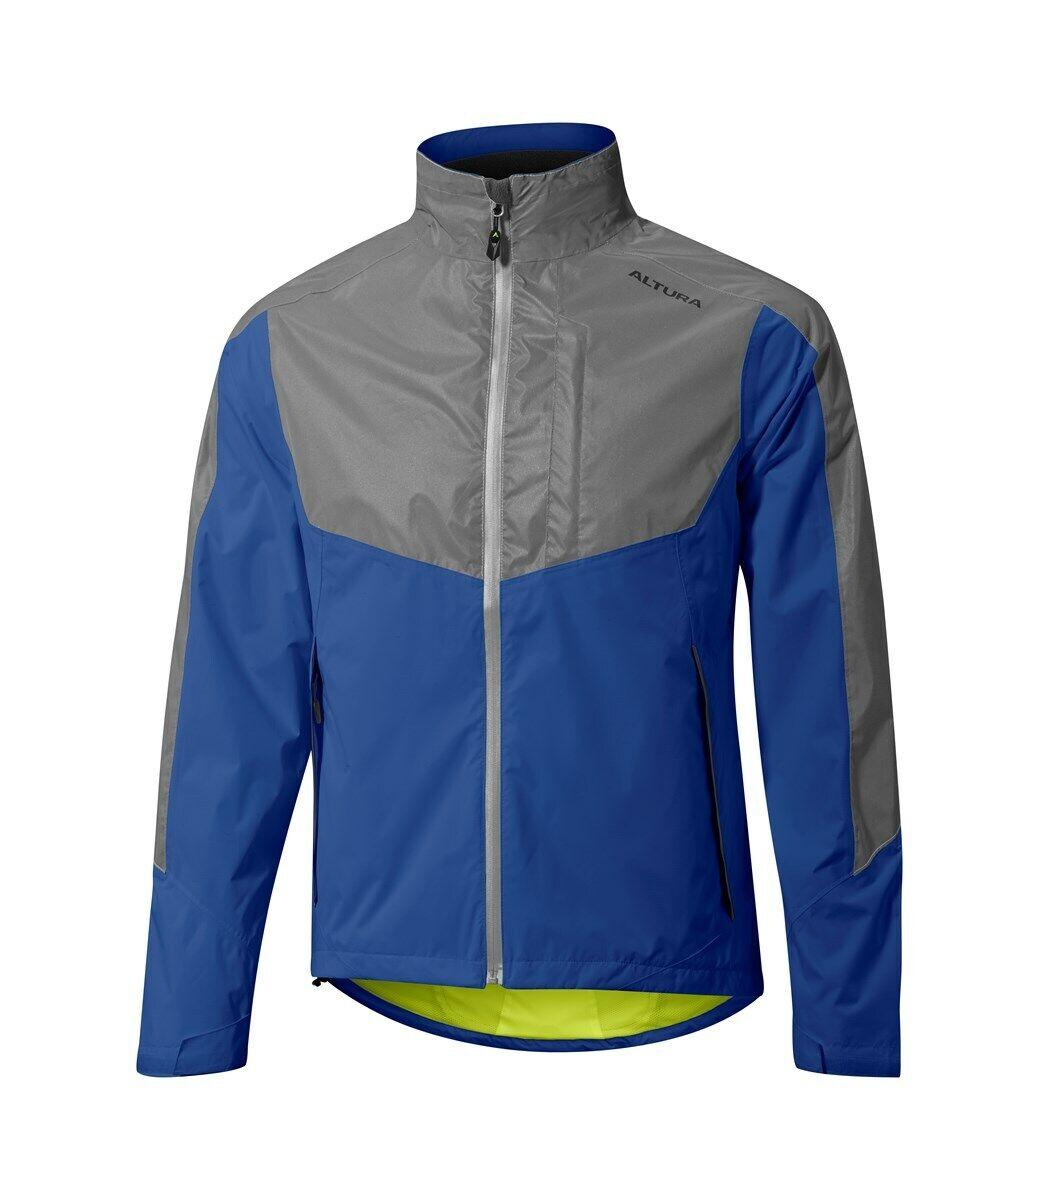 Altura Night Vision Evo 3 Waterproof Mens Cycling Jacket - Royal Blau Large